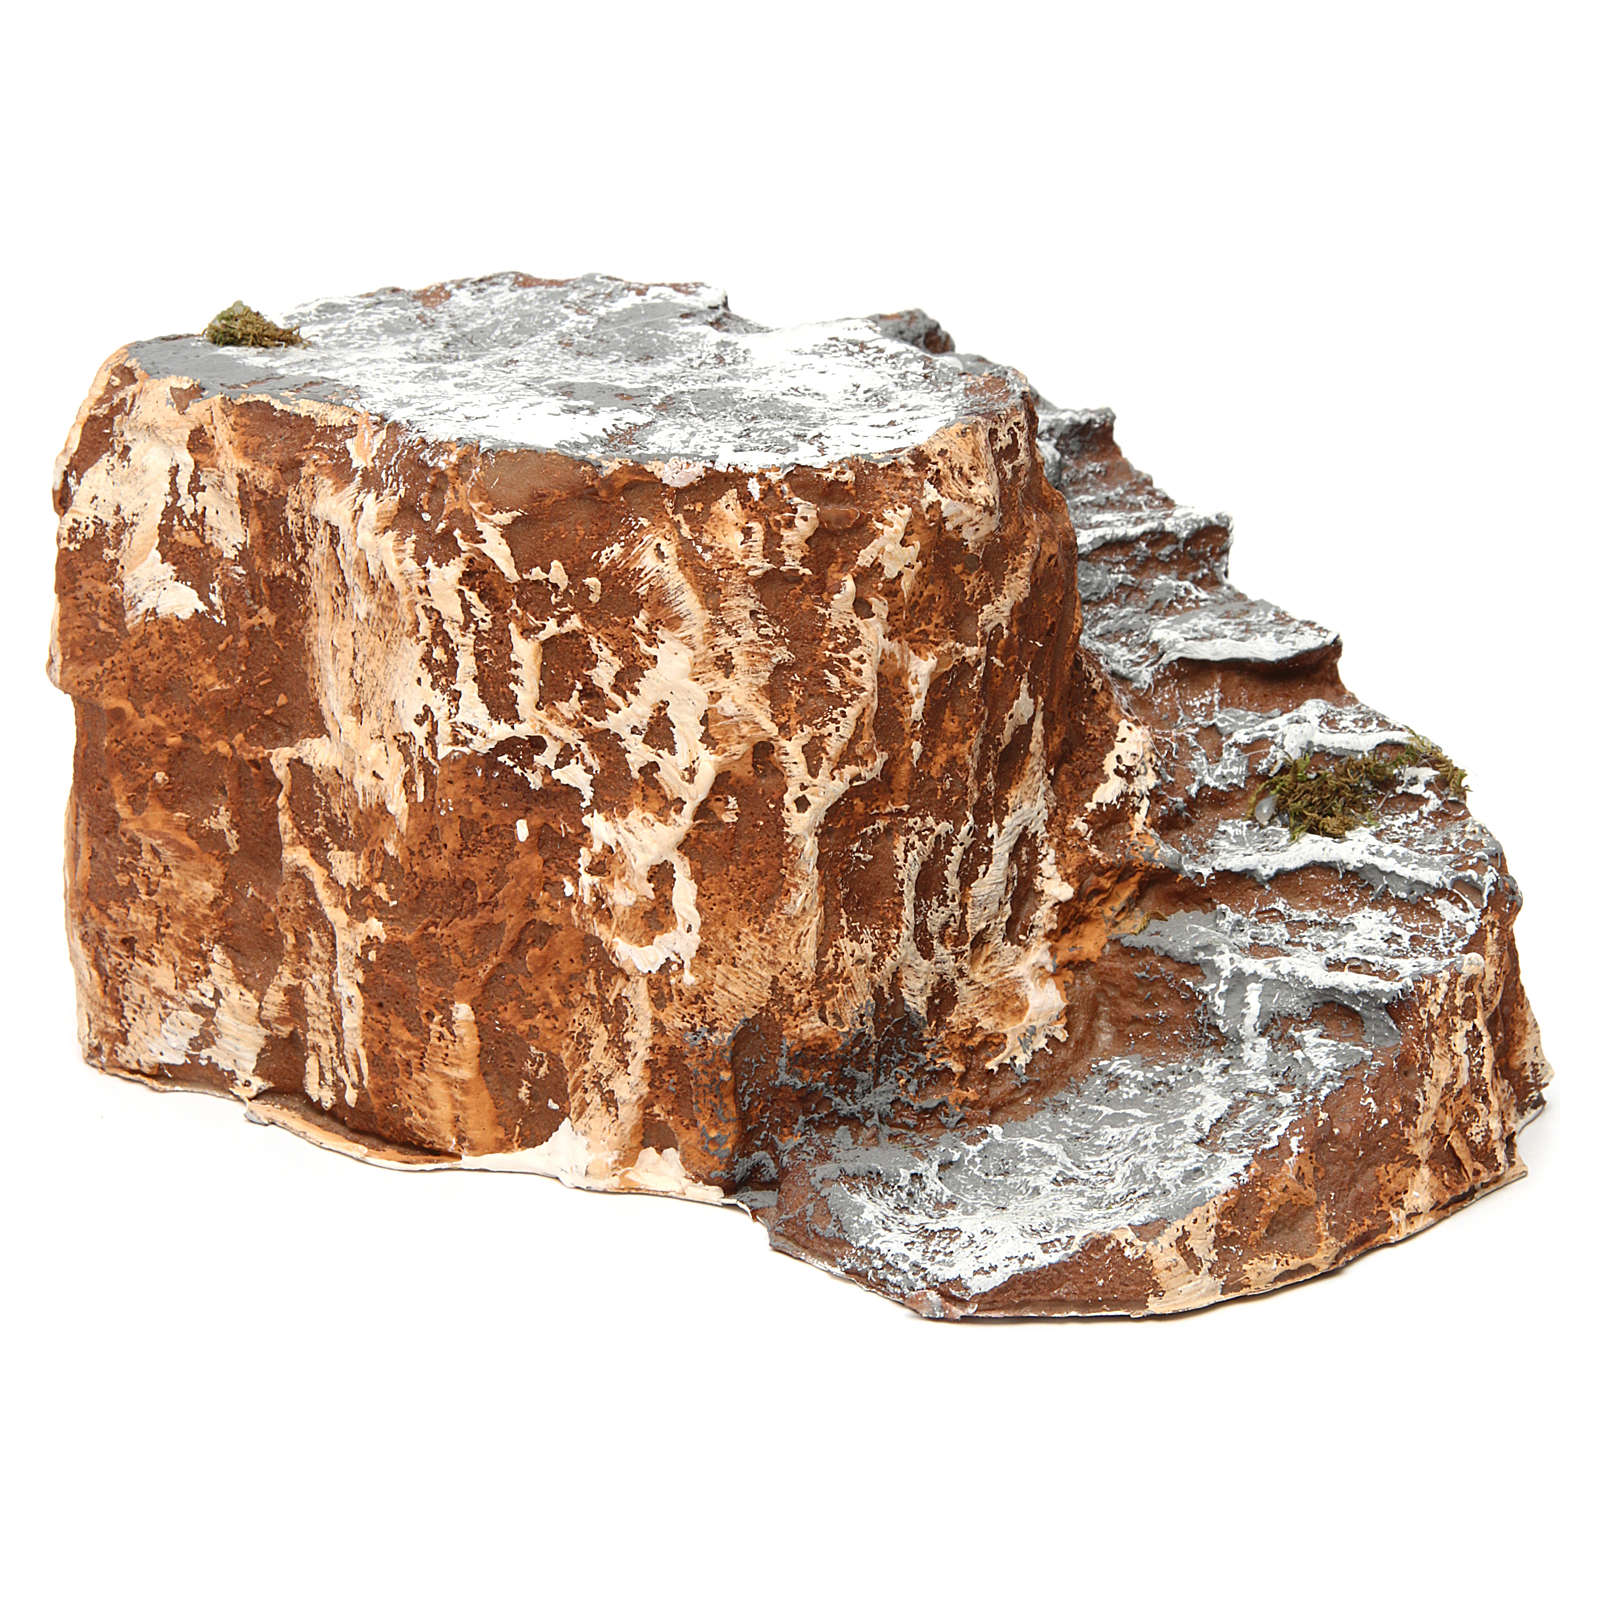 Ambientación base con escalera con curva de resina 10x15x20 cm belén napolitano 4